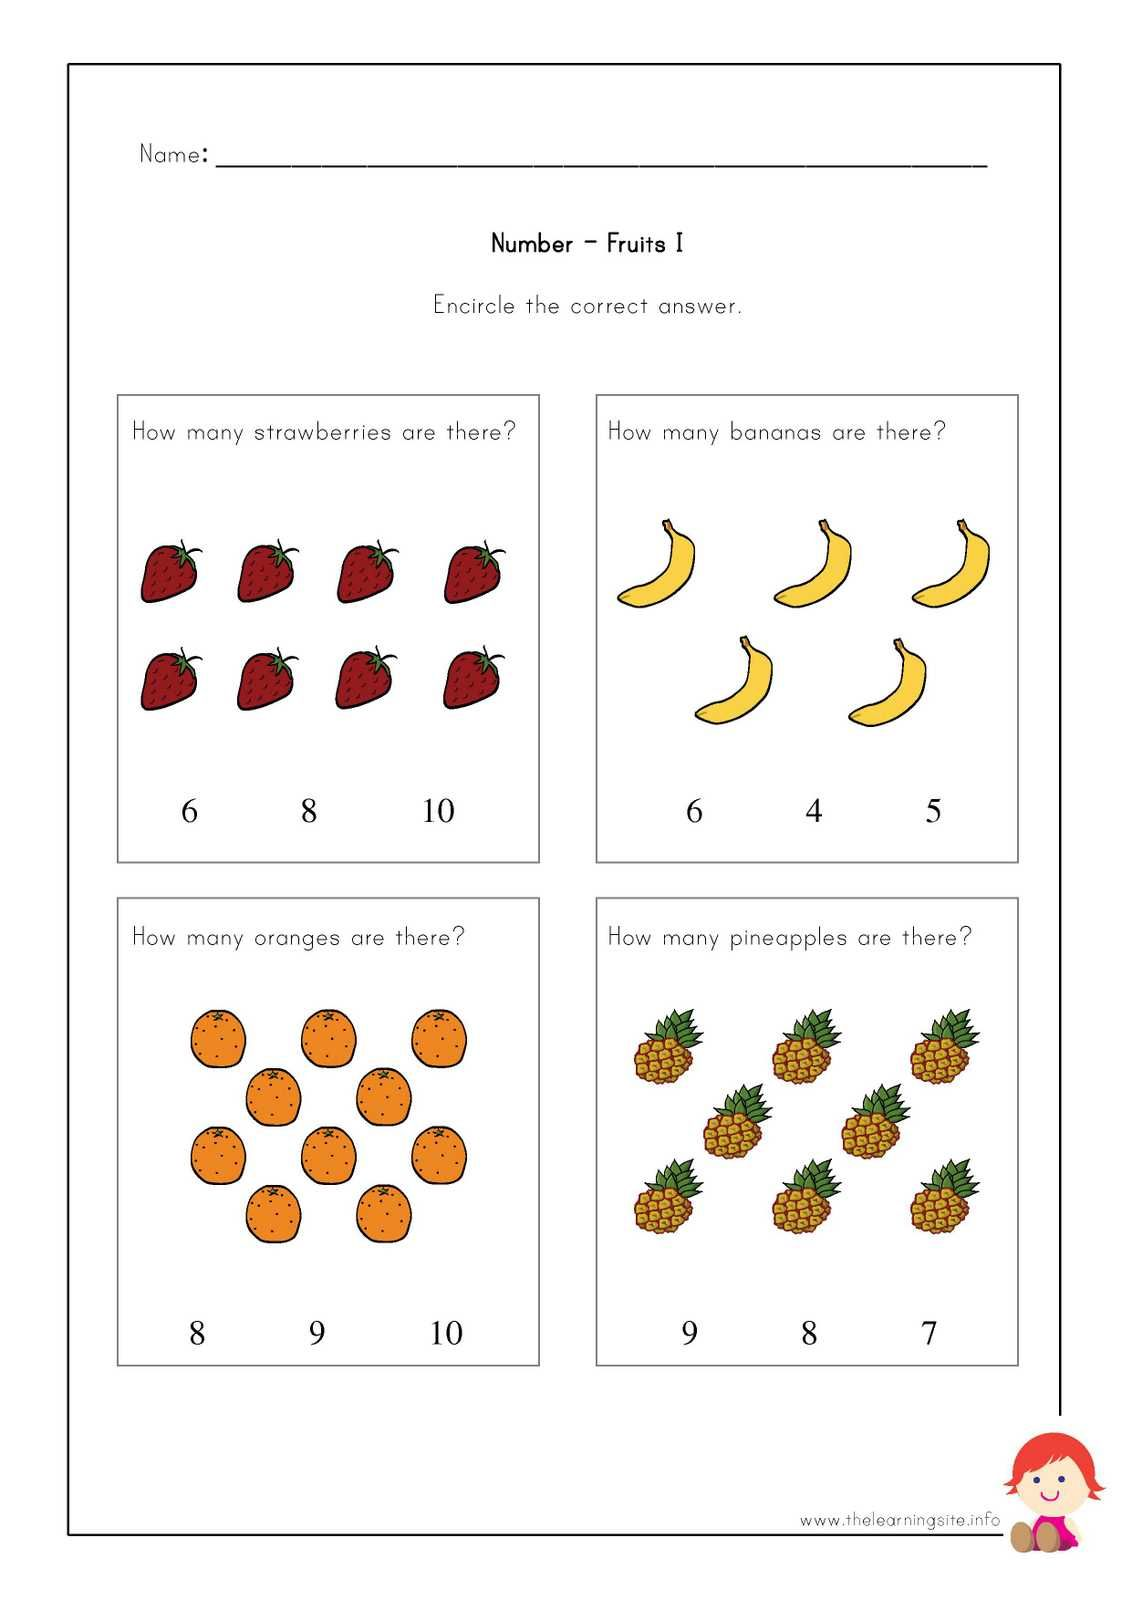 Elements Of Literature Worksheet 2